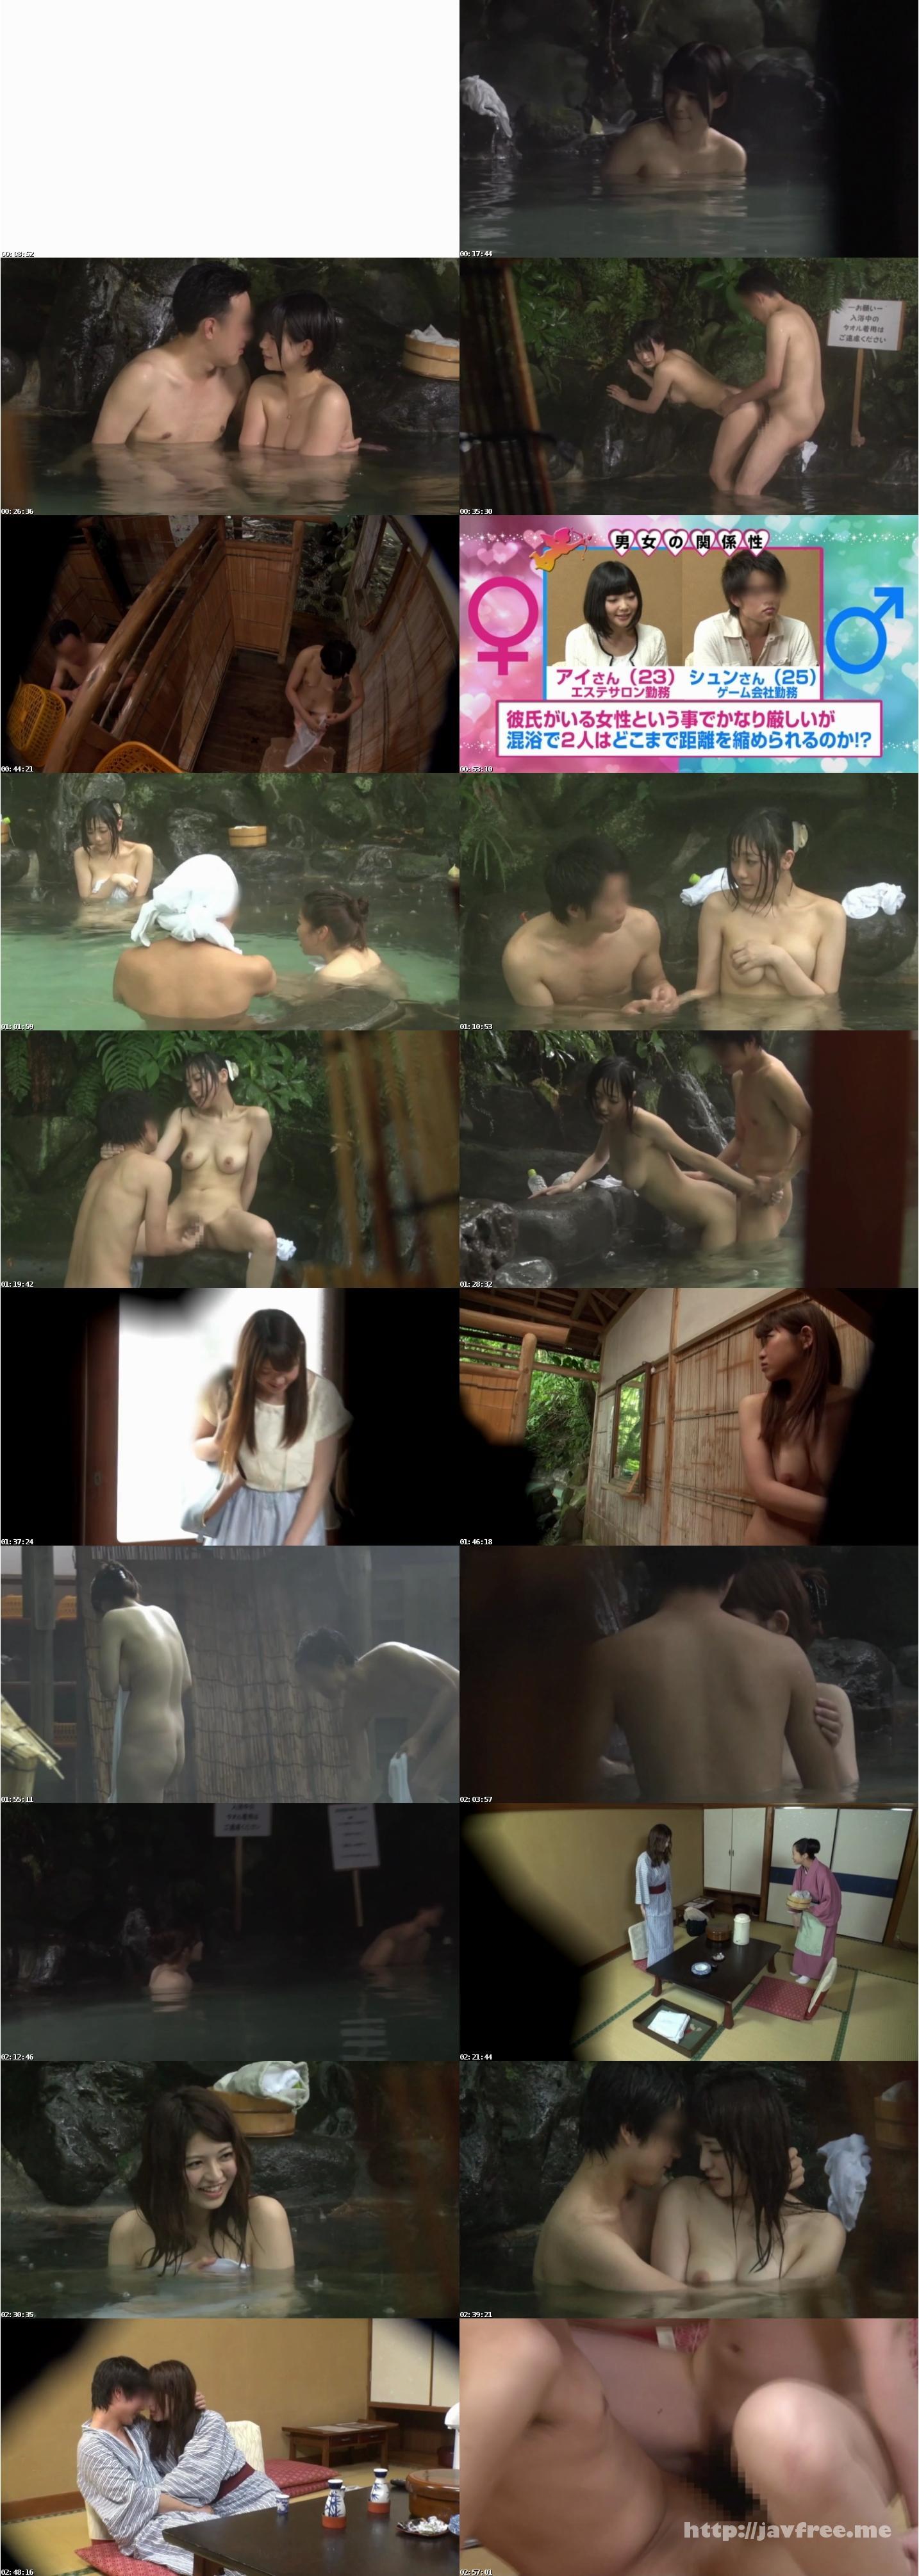 [SDMU 108] 温泉街で見つけた一般男女が出会ってすぐに「混浴モニター体験」 初対面でいきなり裸同士!の即席カップルは、入浴中に火が付くまで何分?3 堀田利羅 SDMU